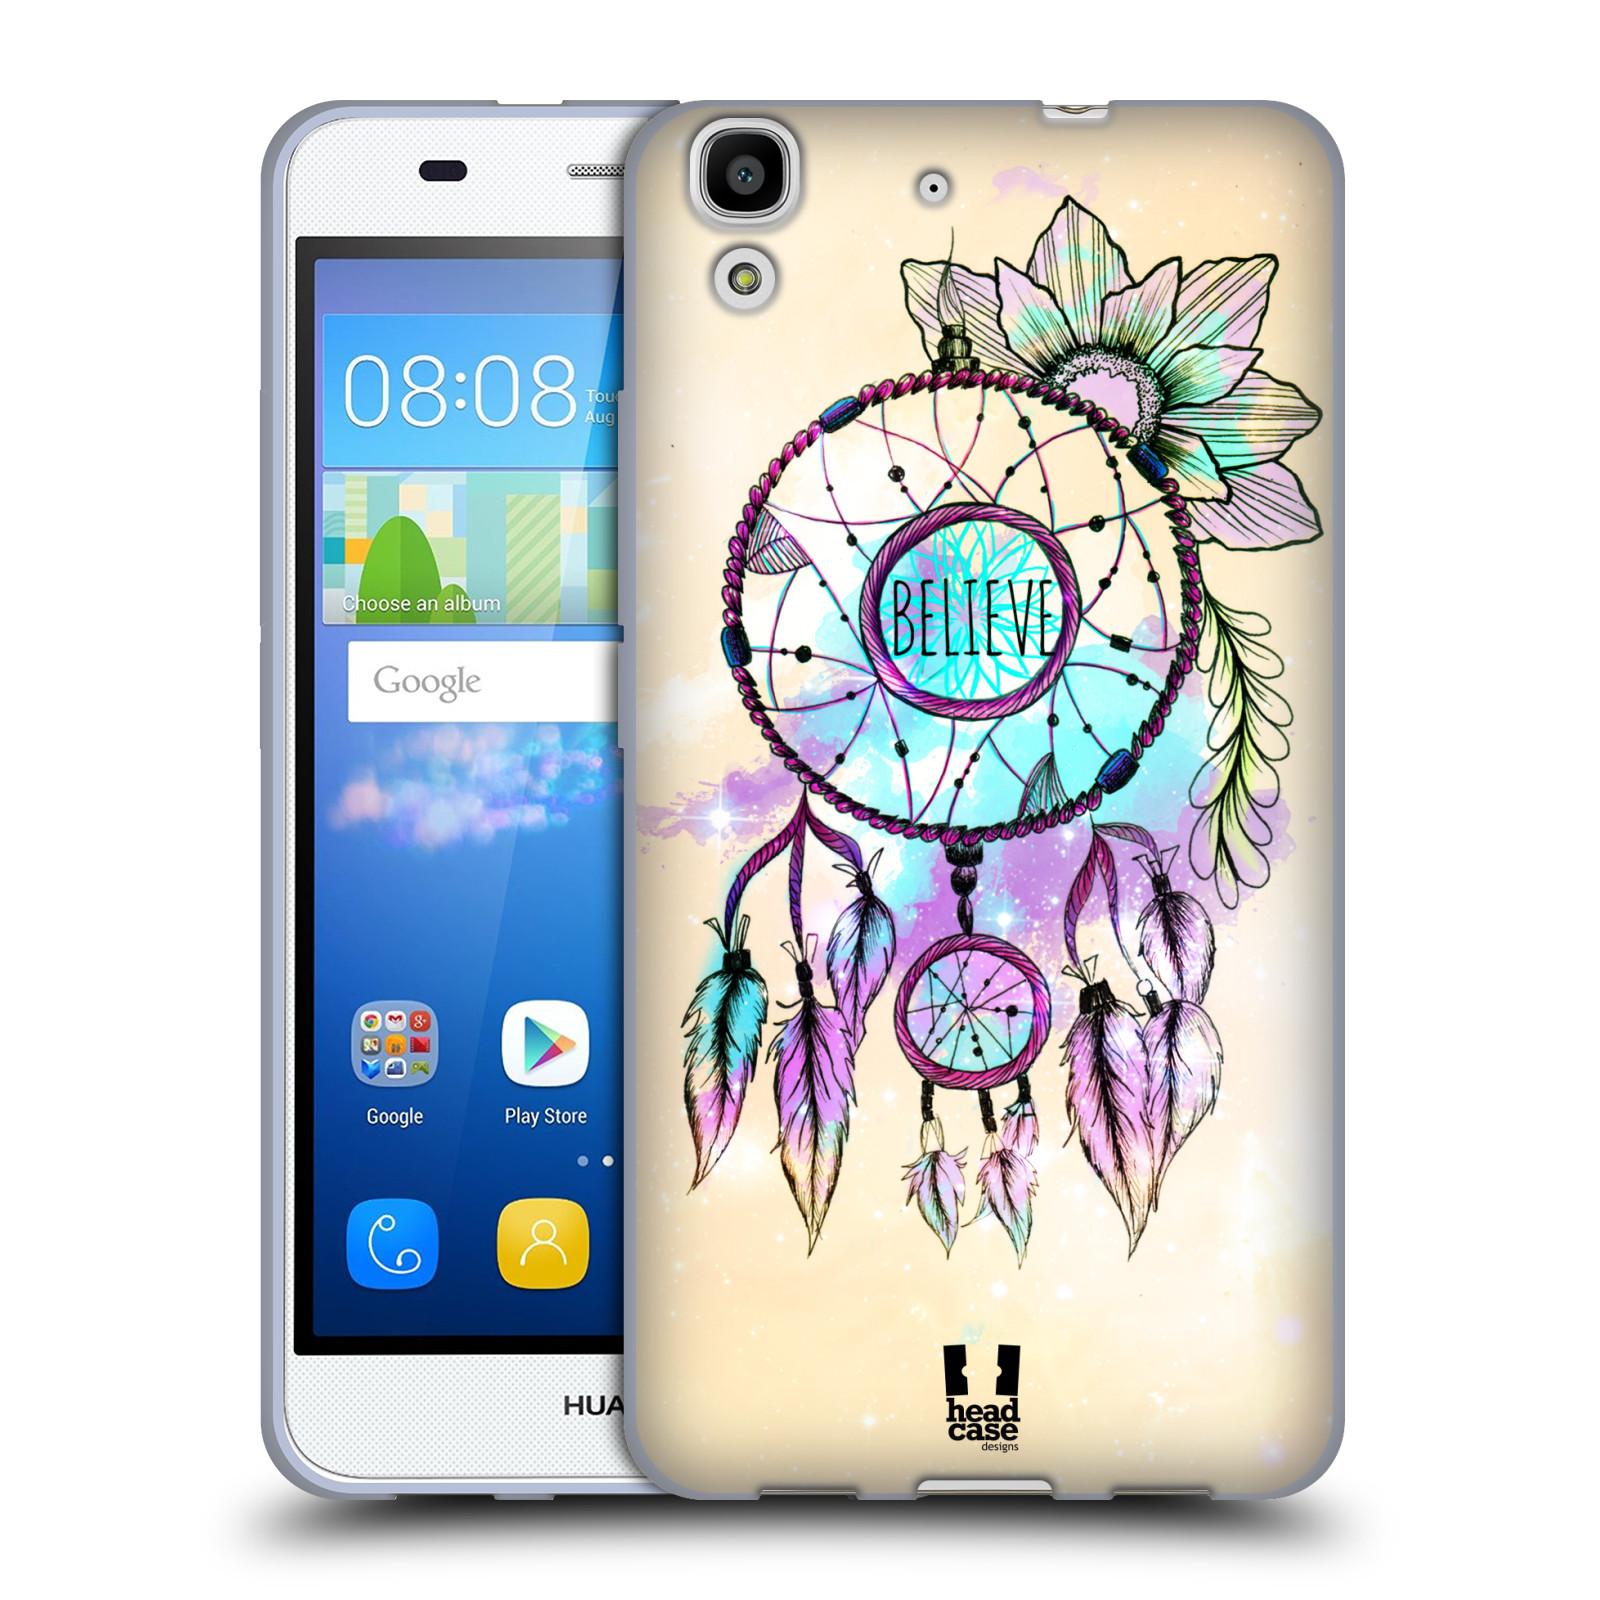 Silikonové pouzdro na mobil Huawei Y6 HEAD CASE MIX BELIEVE